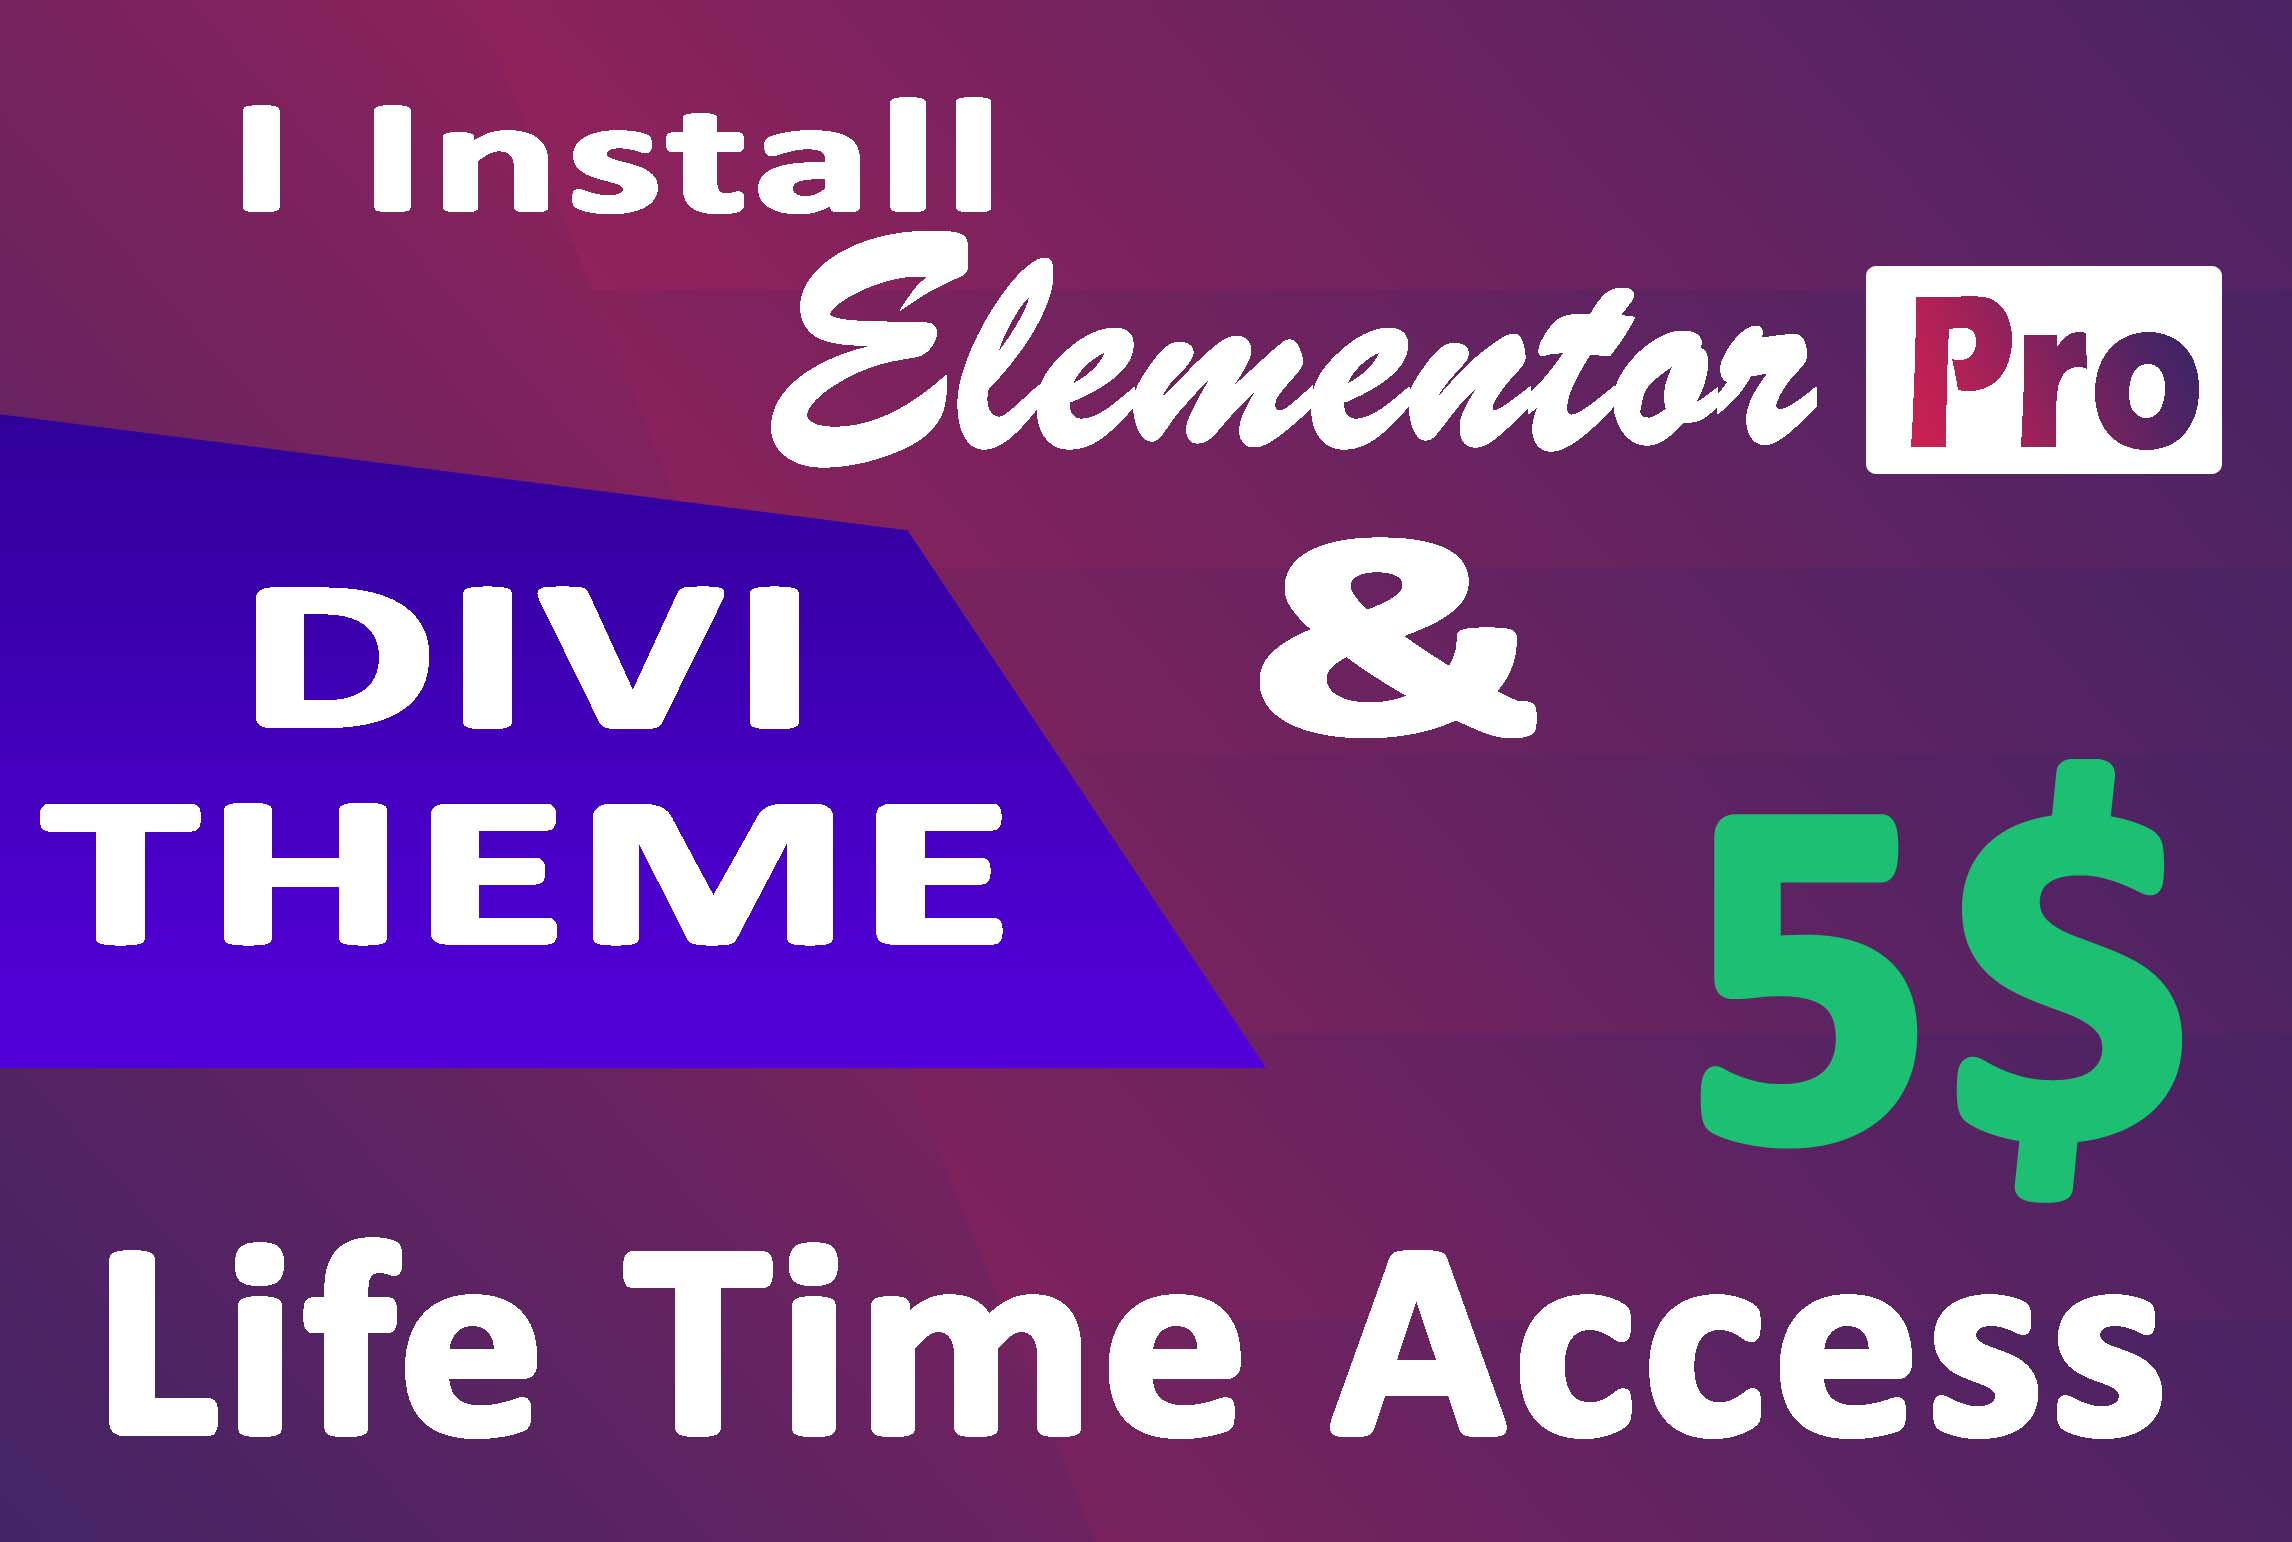 Install Elementor pro plugin on your website